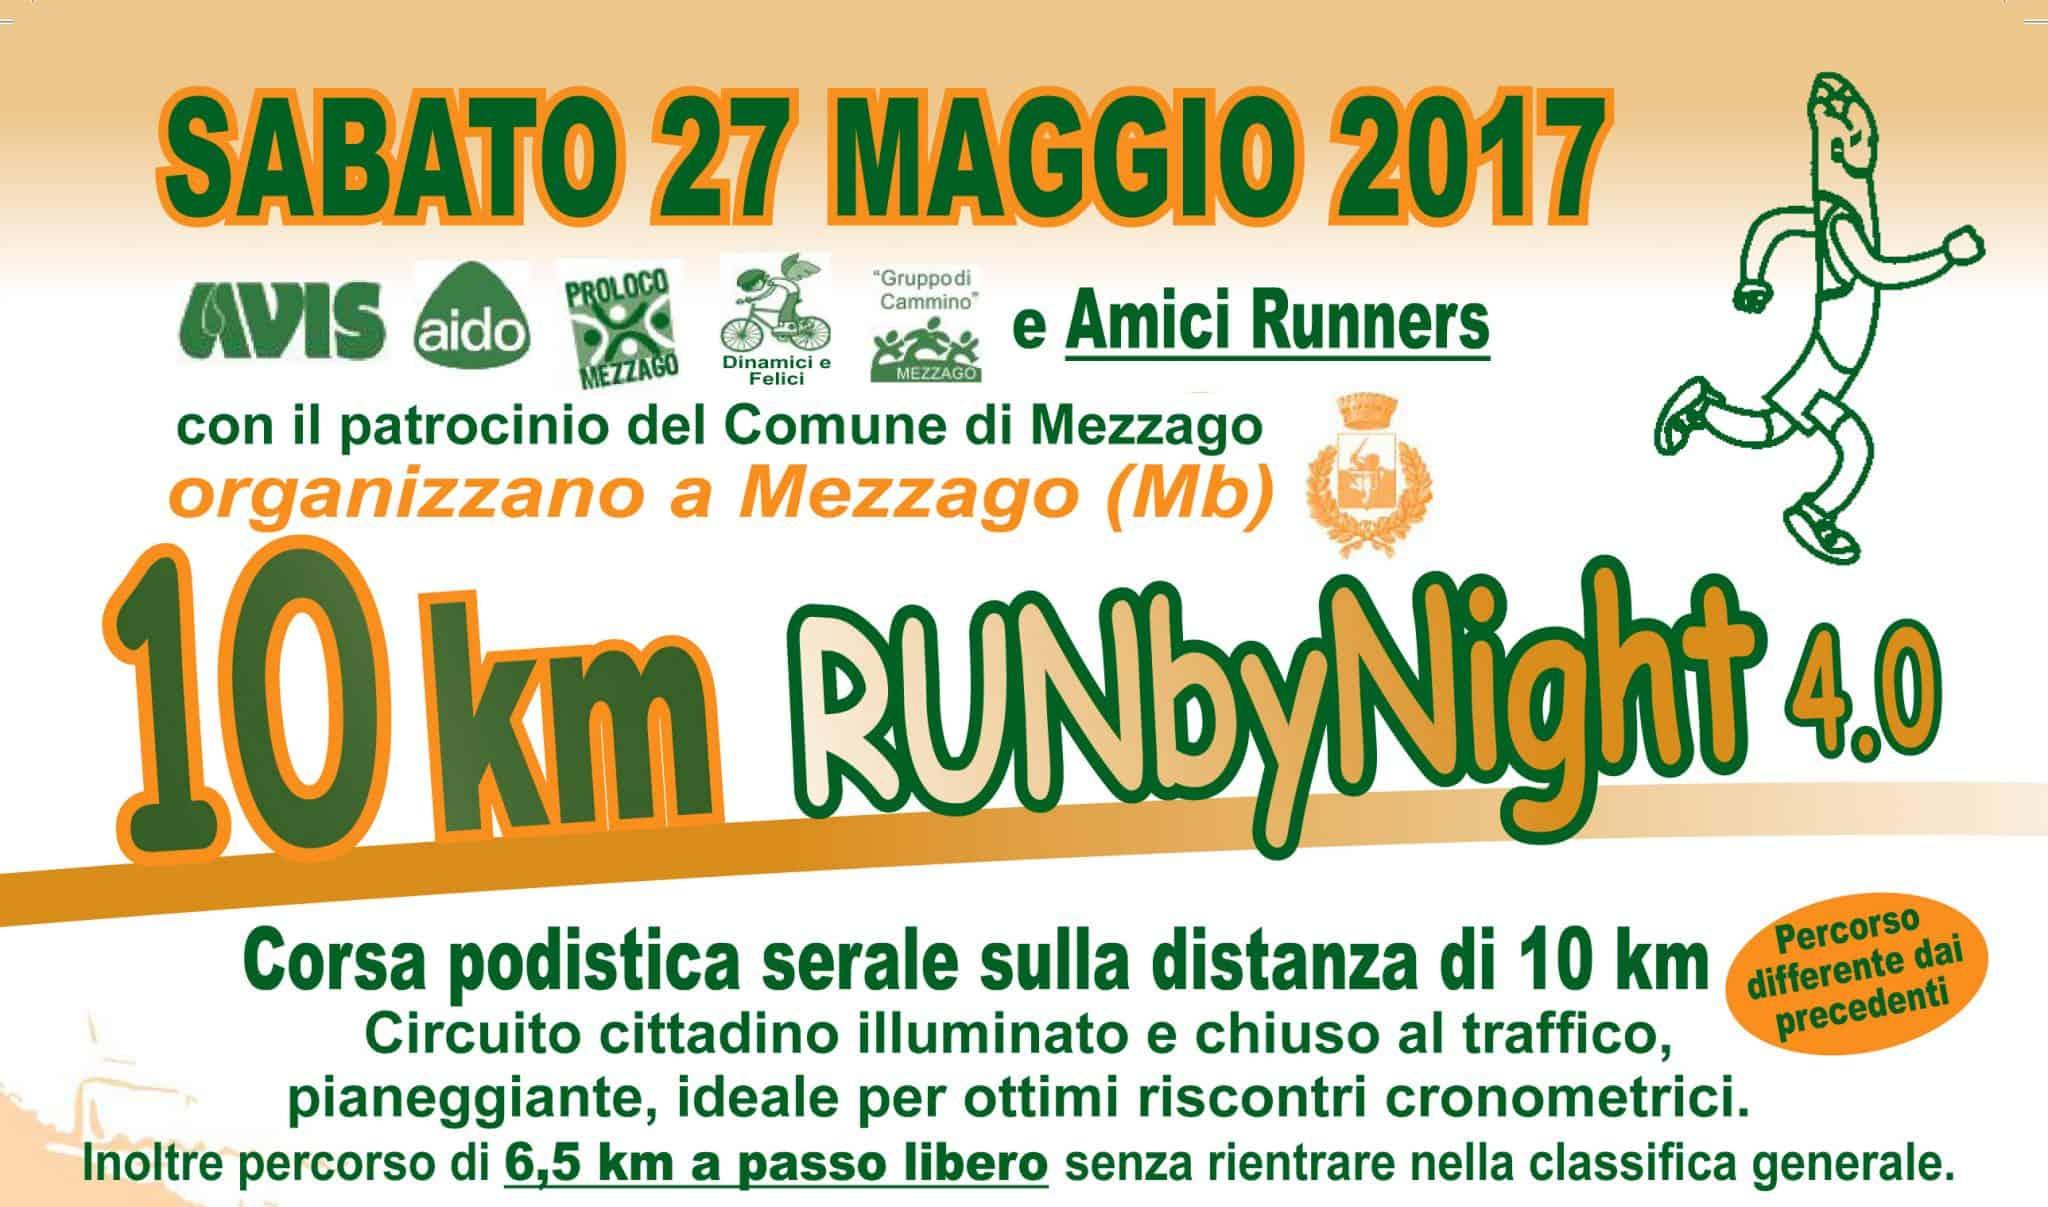 Mezzago Run By Night 4.0